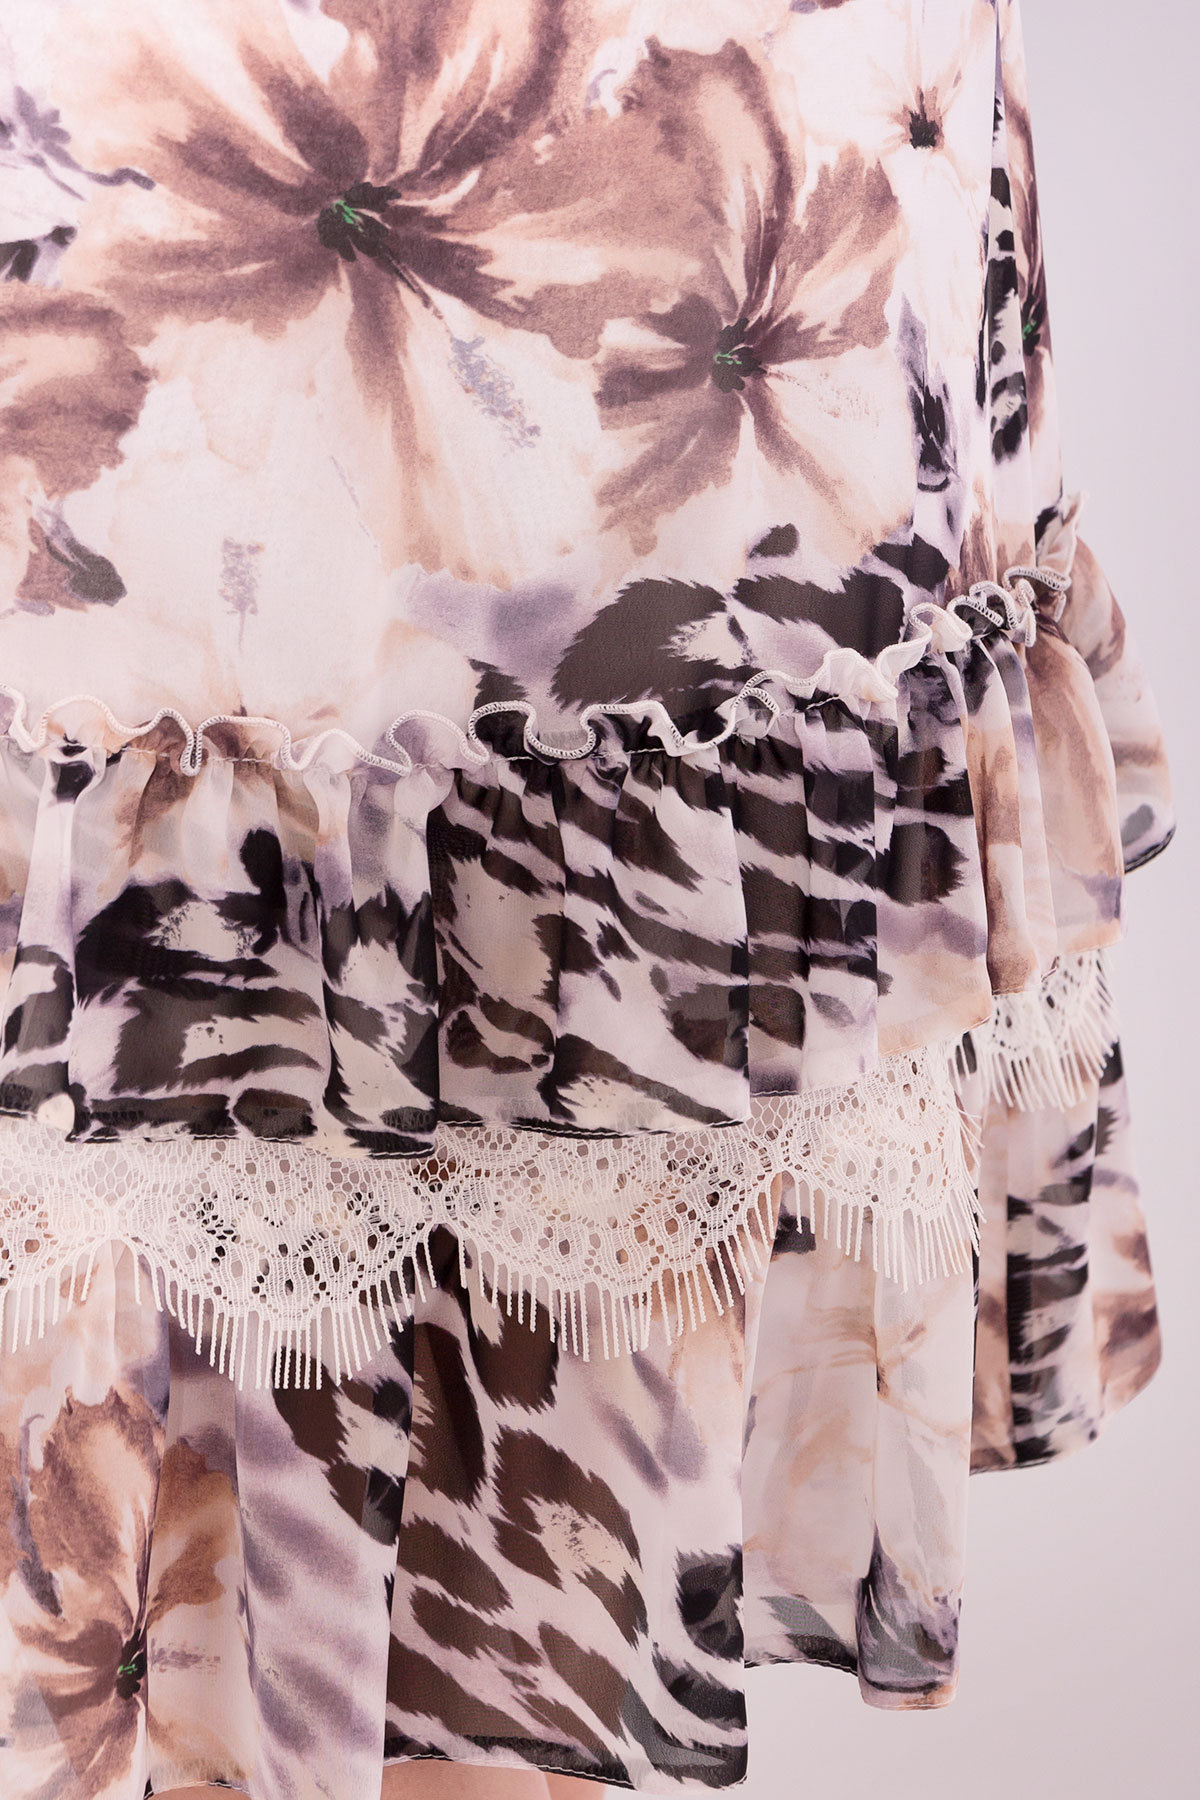 Платье Нектар 6916 АРТ. 42957 Цвет: Леопард цветы молоко/беж - фото 4, интернет магазин tm-modus.ru